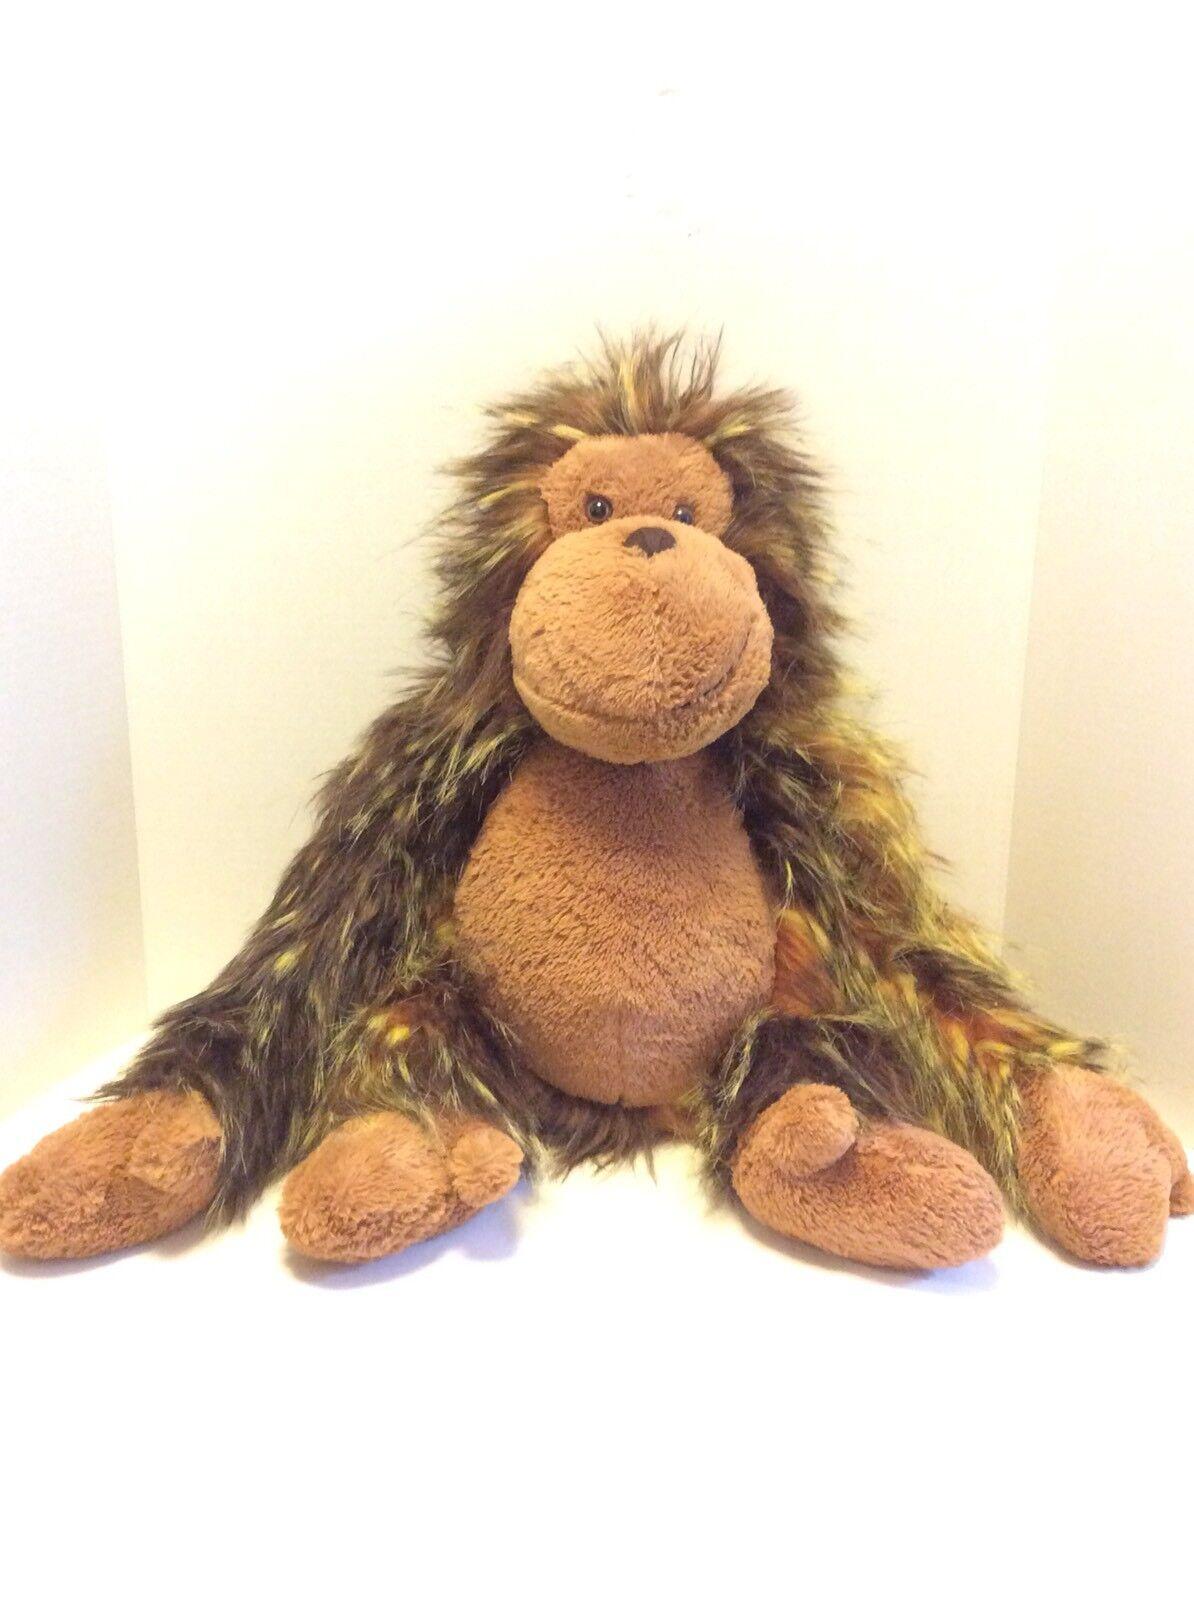 Jellycat Oscar The Orangutan Ape 22in Furry Large Plush Stuffed Animal Gorilla